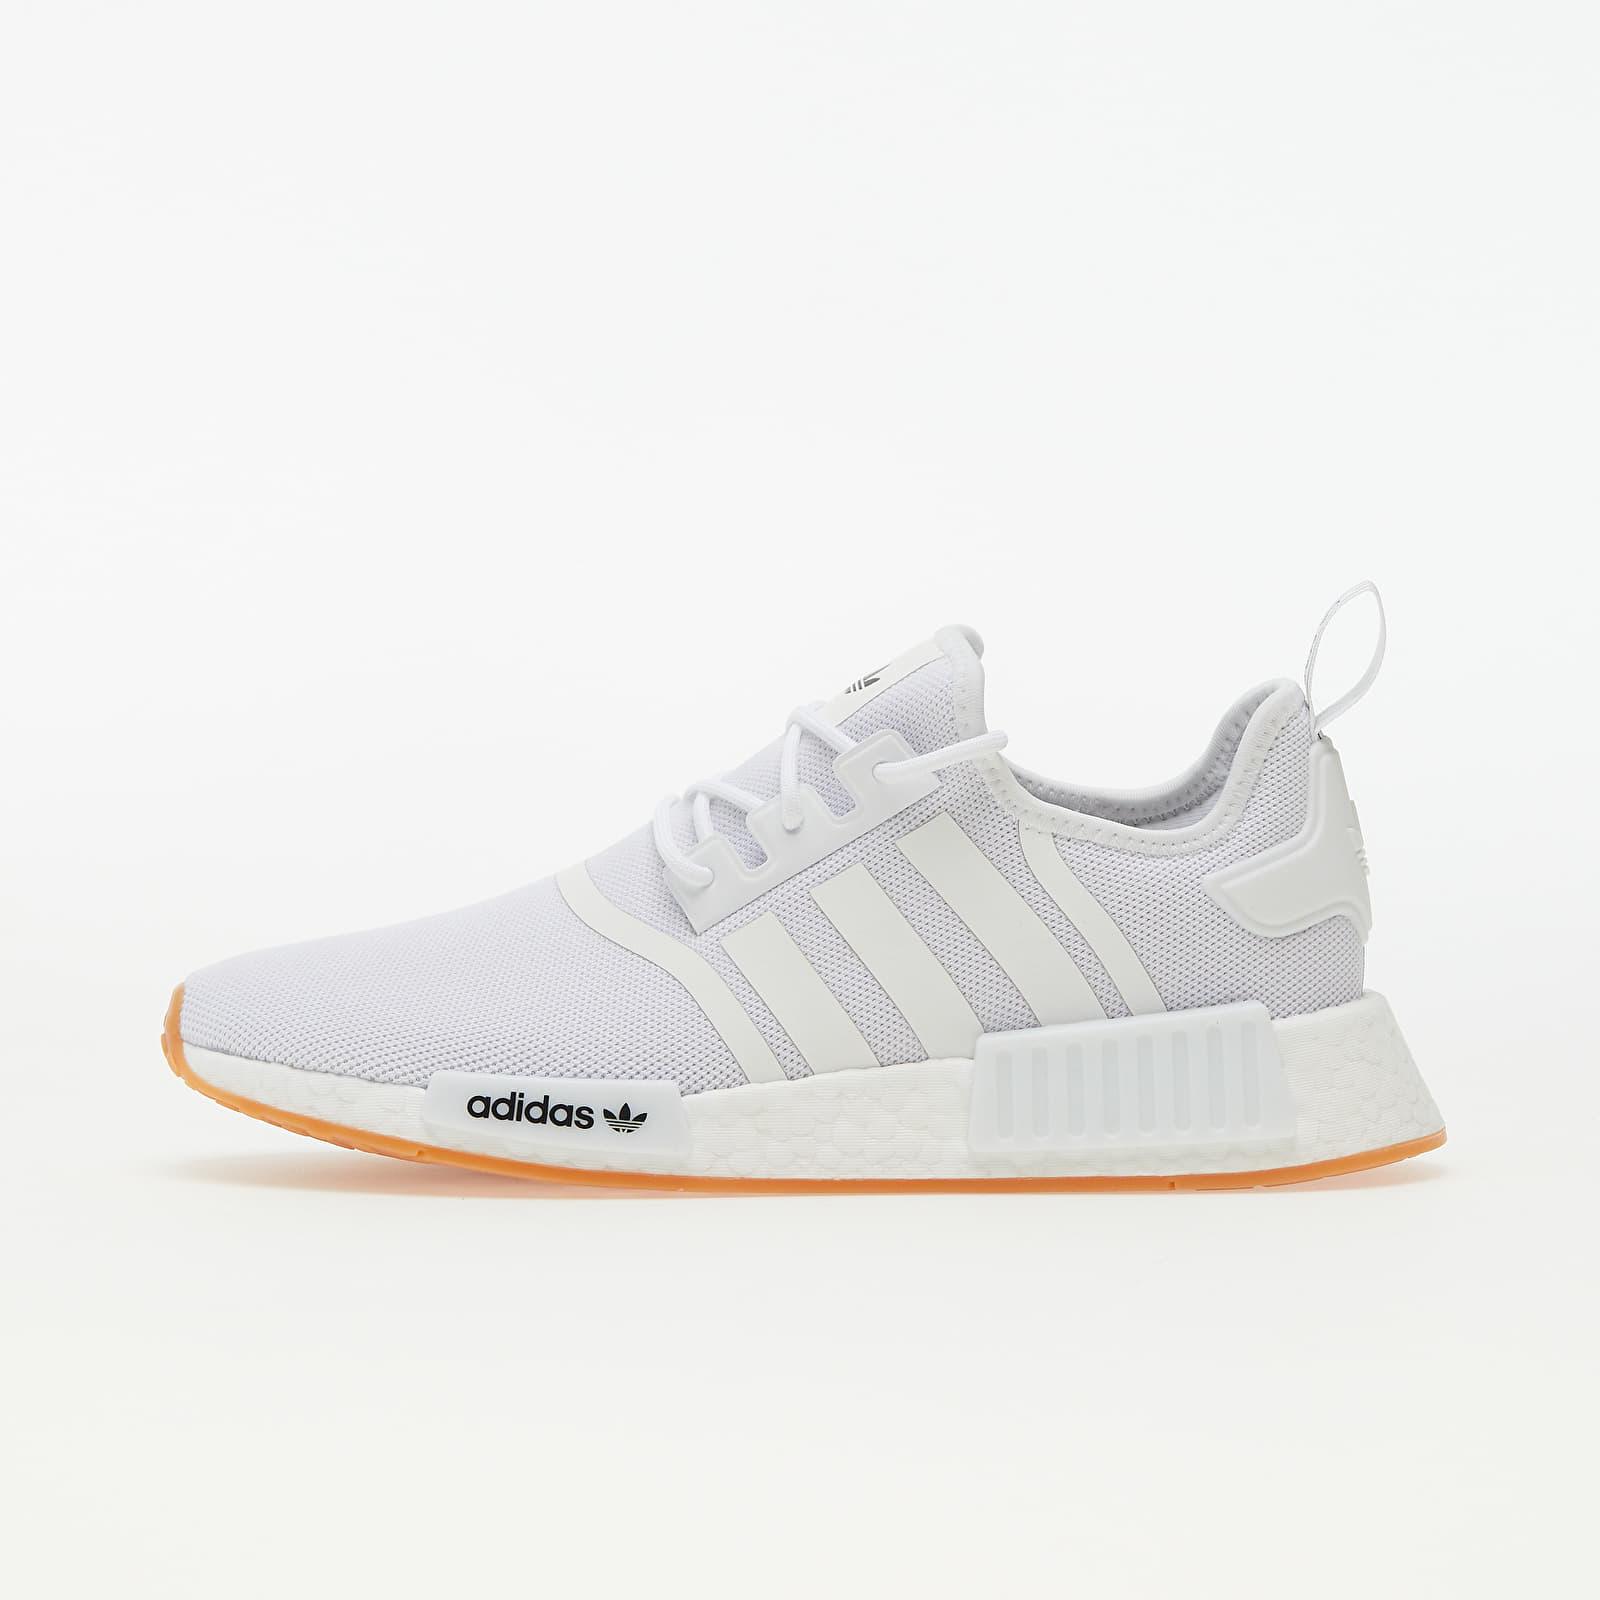 adidas NMD_R1 Primeblue Ftw White/ Ftw White/ Gum2 EUR 40